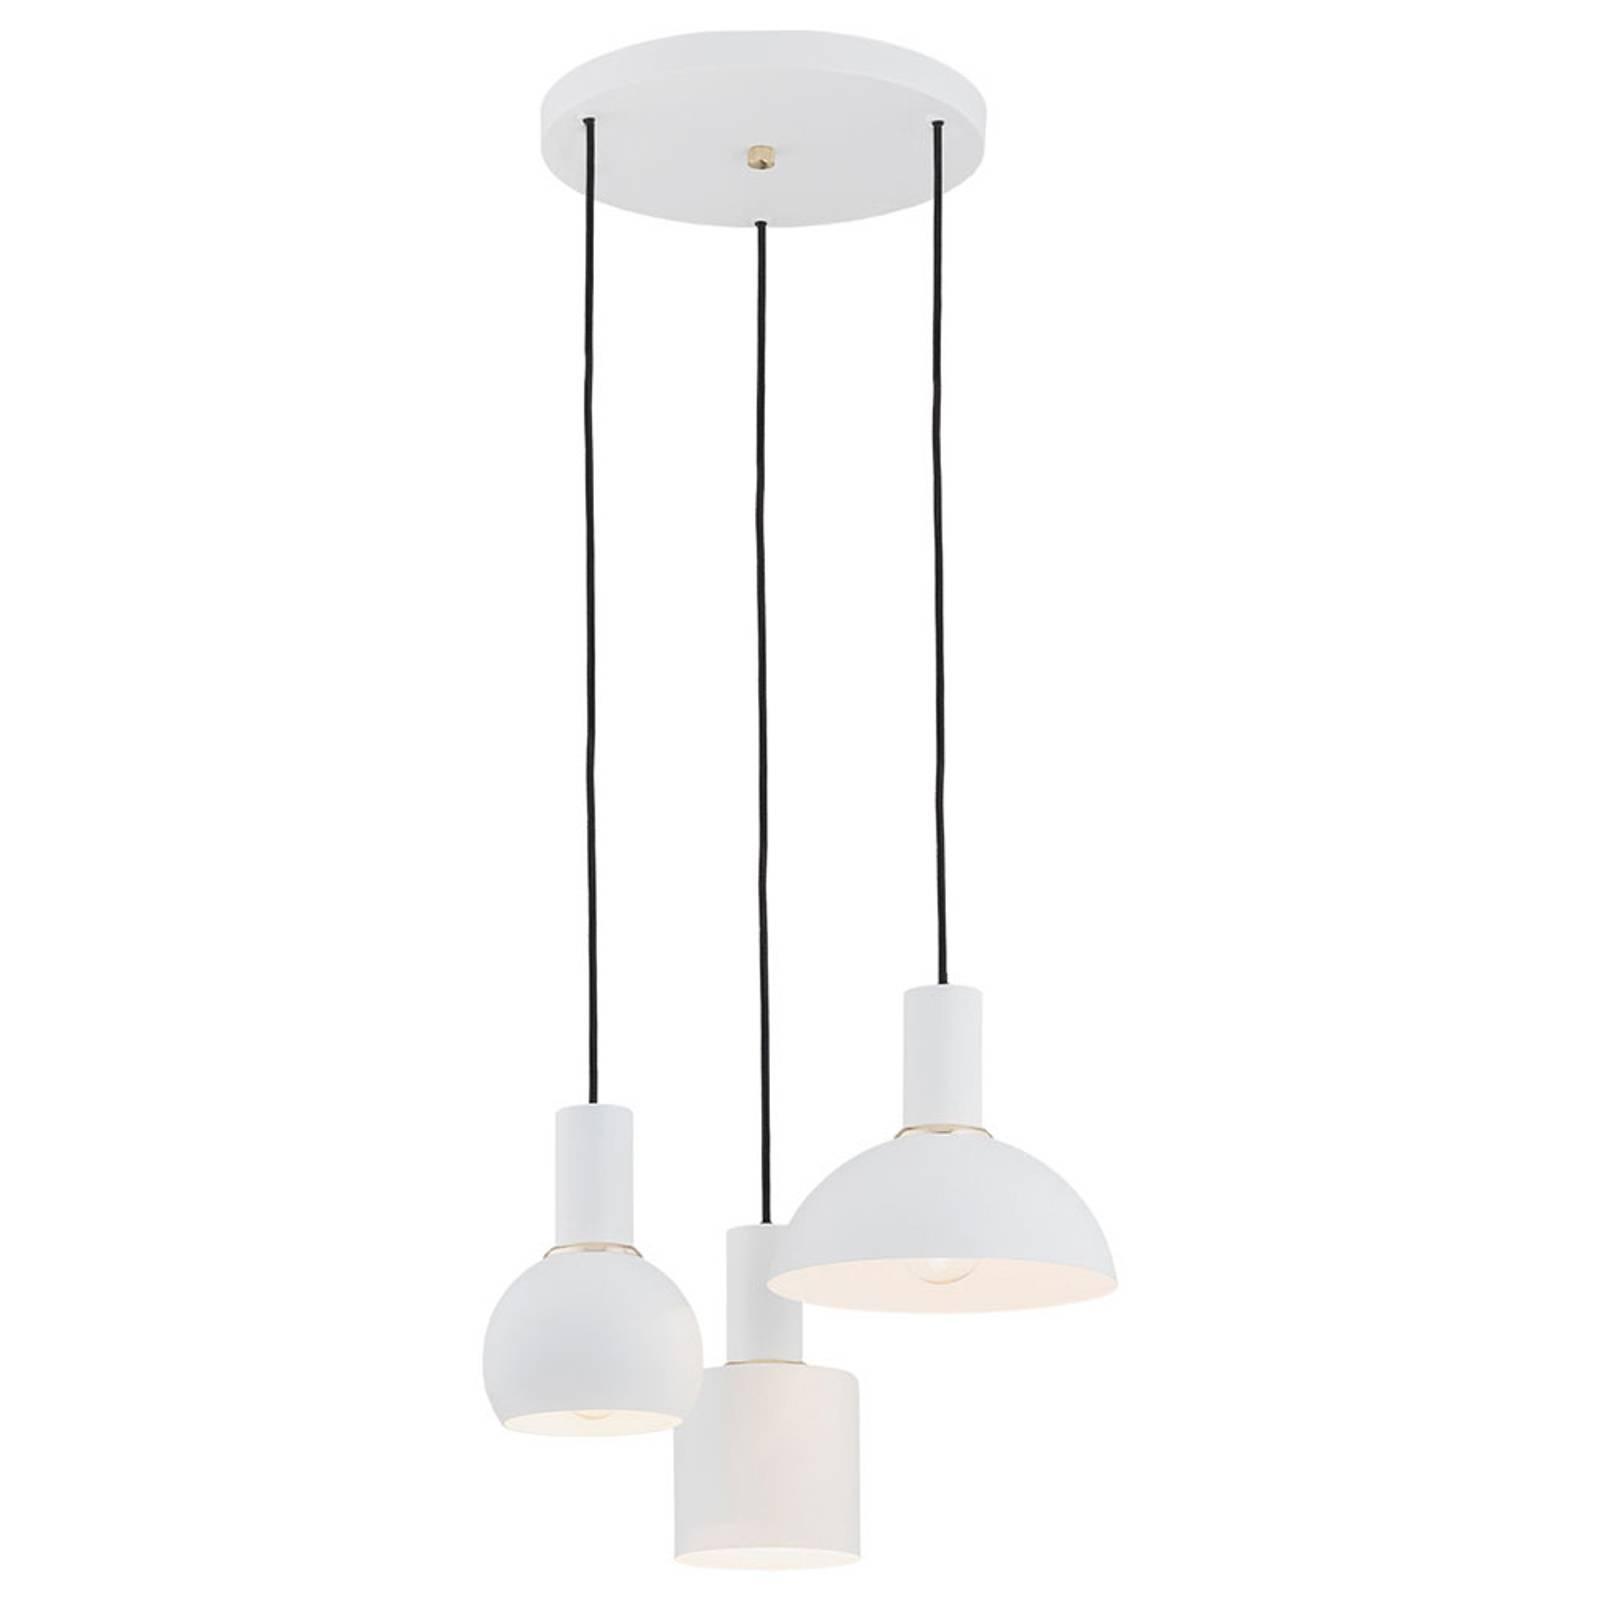 Suspension Selma, à 3 lampes, blanche